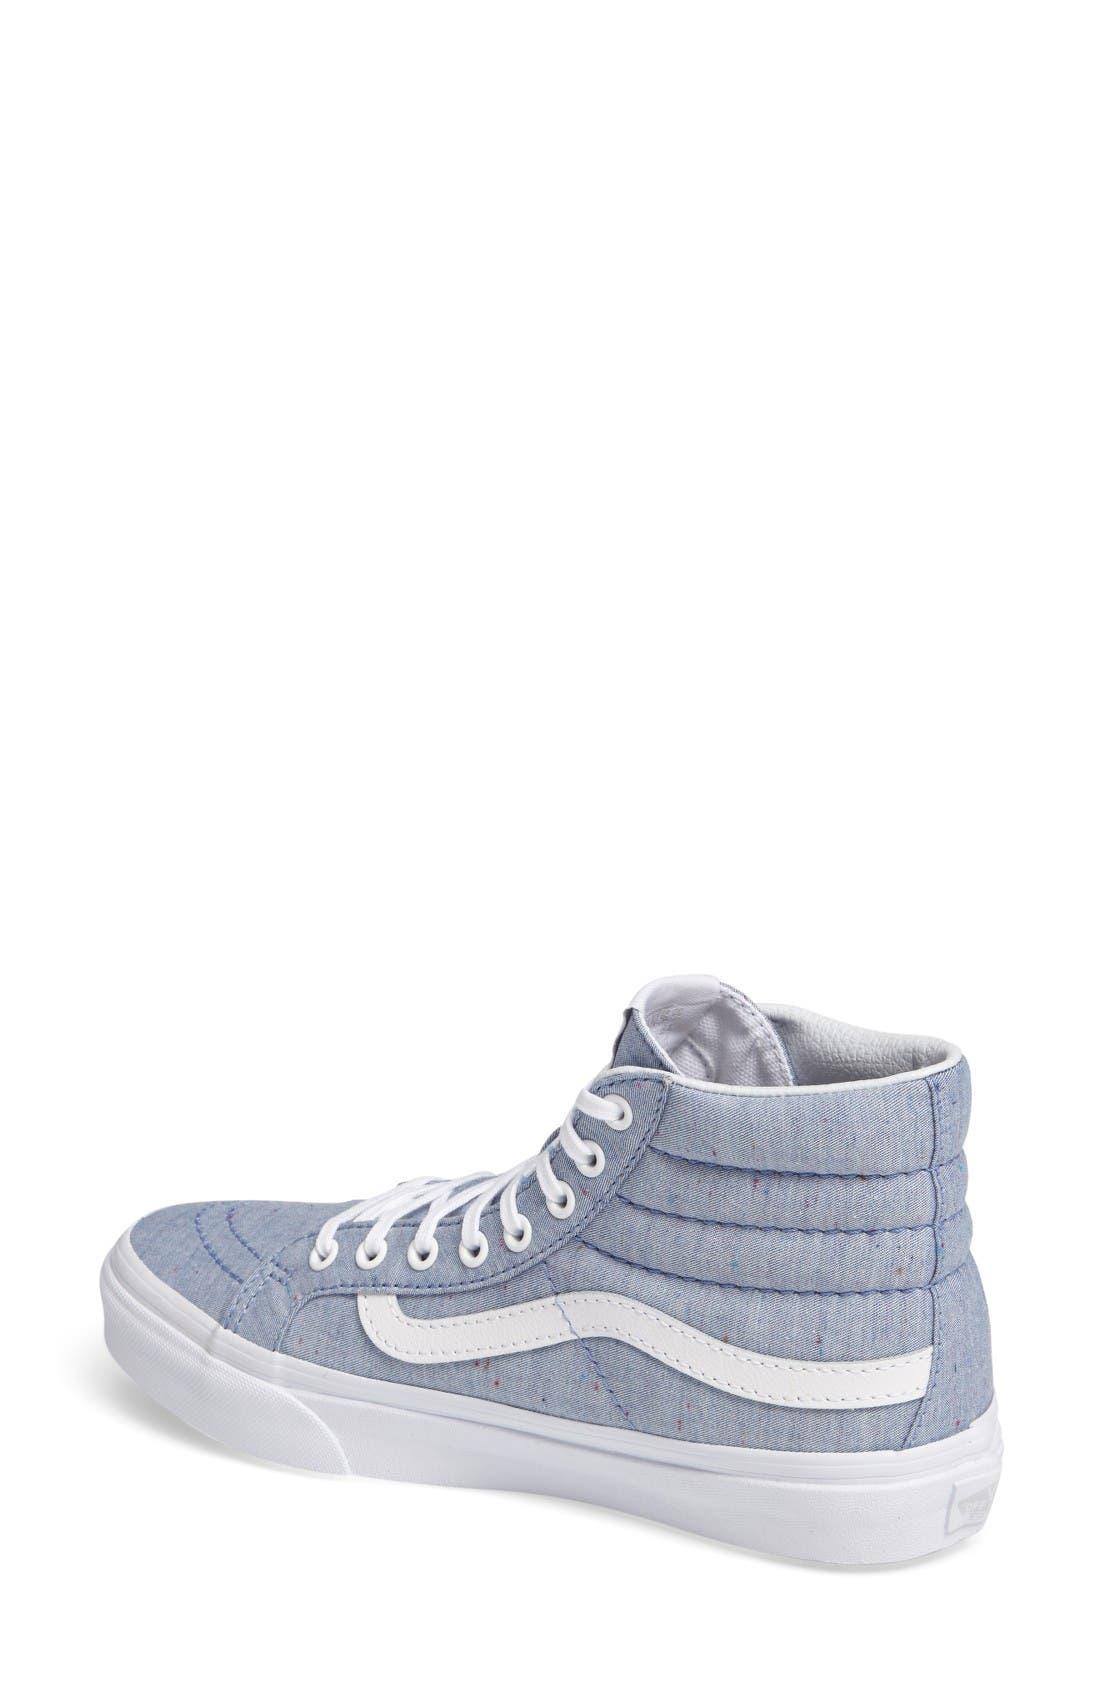 Alternate Image 2  - Vans Sk-8 Hi Slim Sneaker (Women)